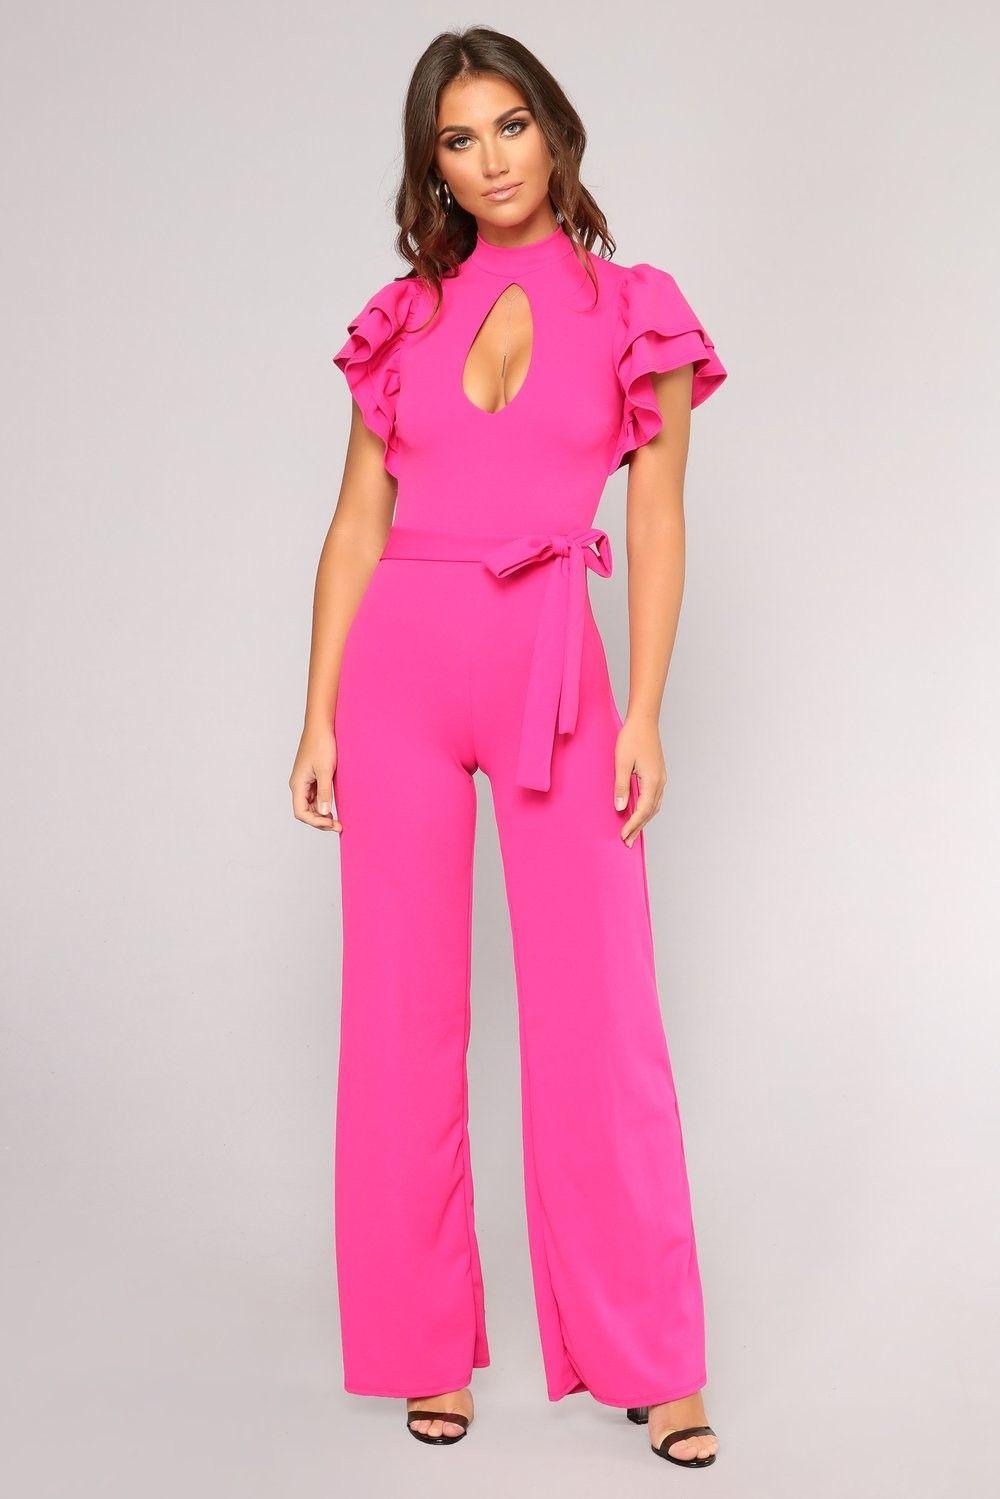 f05aa9ef3fec Charmane Ruffle Jumpsuit - Fuchsia  34.99  ootd  style  fashion  runway   fashionable